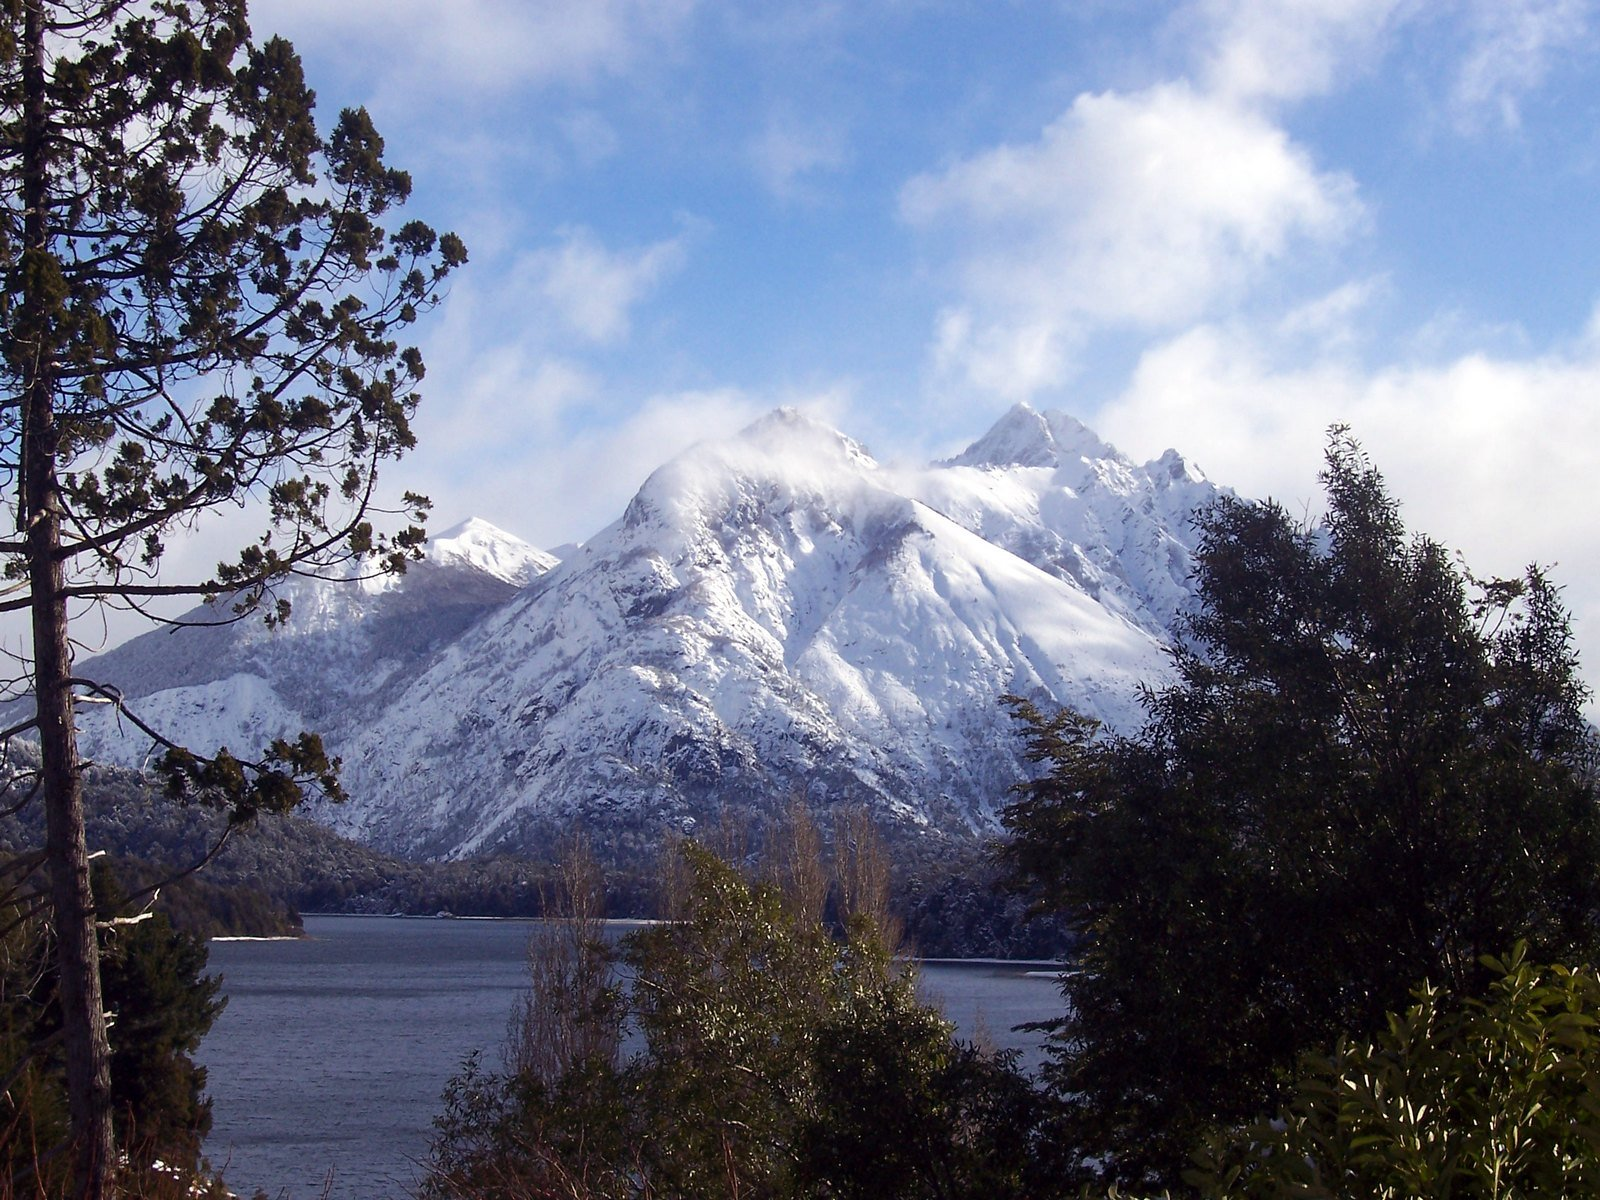 Winter Mountain Backgrounds wallpaper Winter Mountain Backgrounds hd 1600x1200